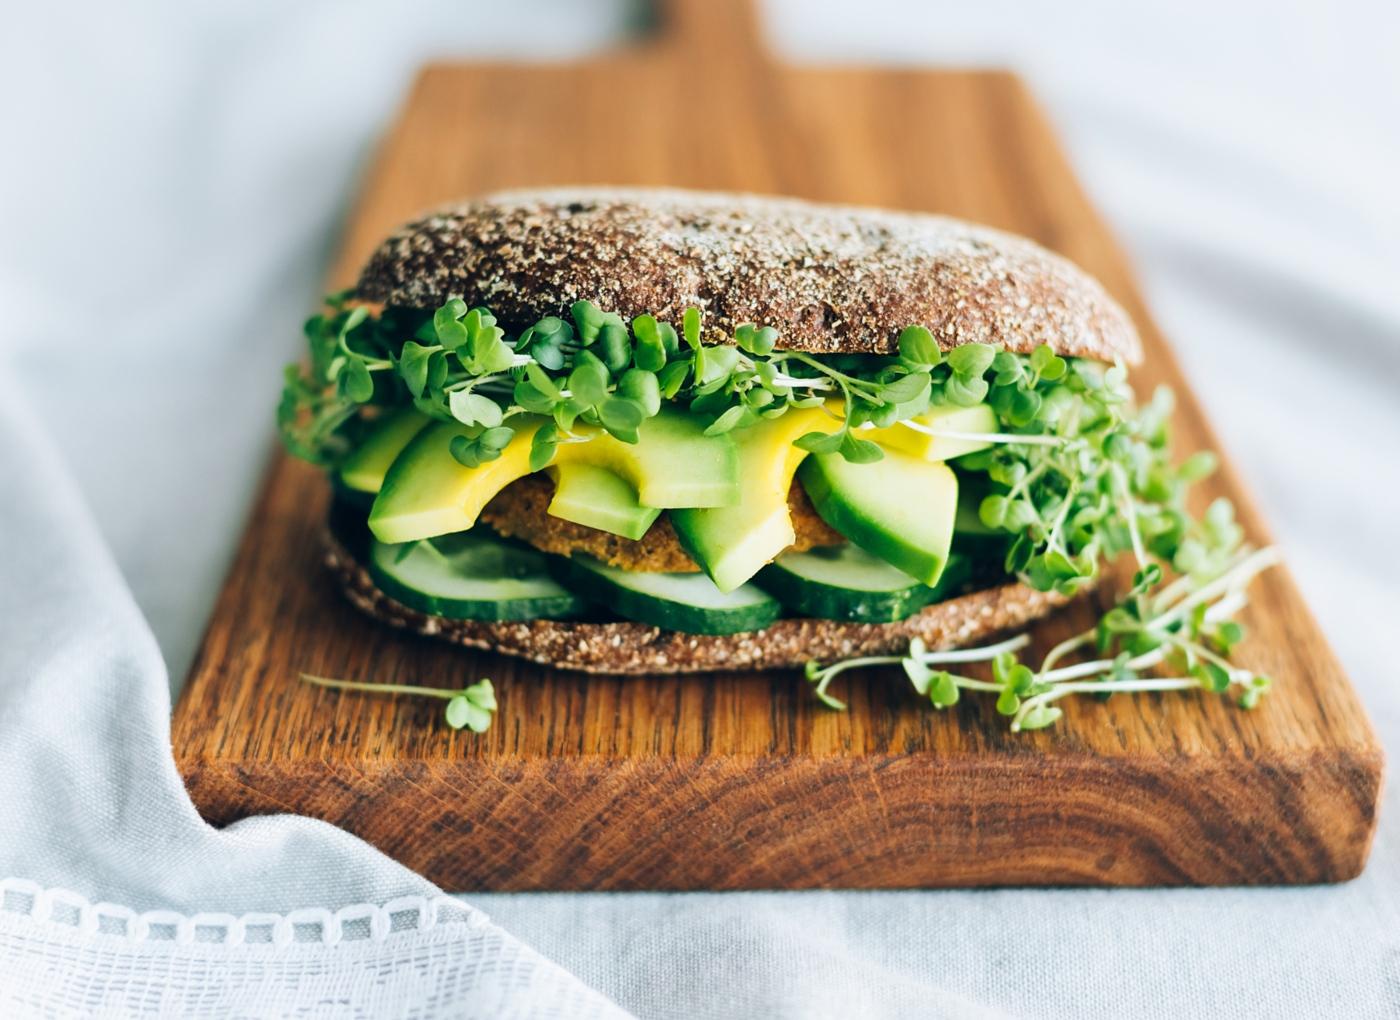 Receitas vegan: hamburguer de lentilhas